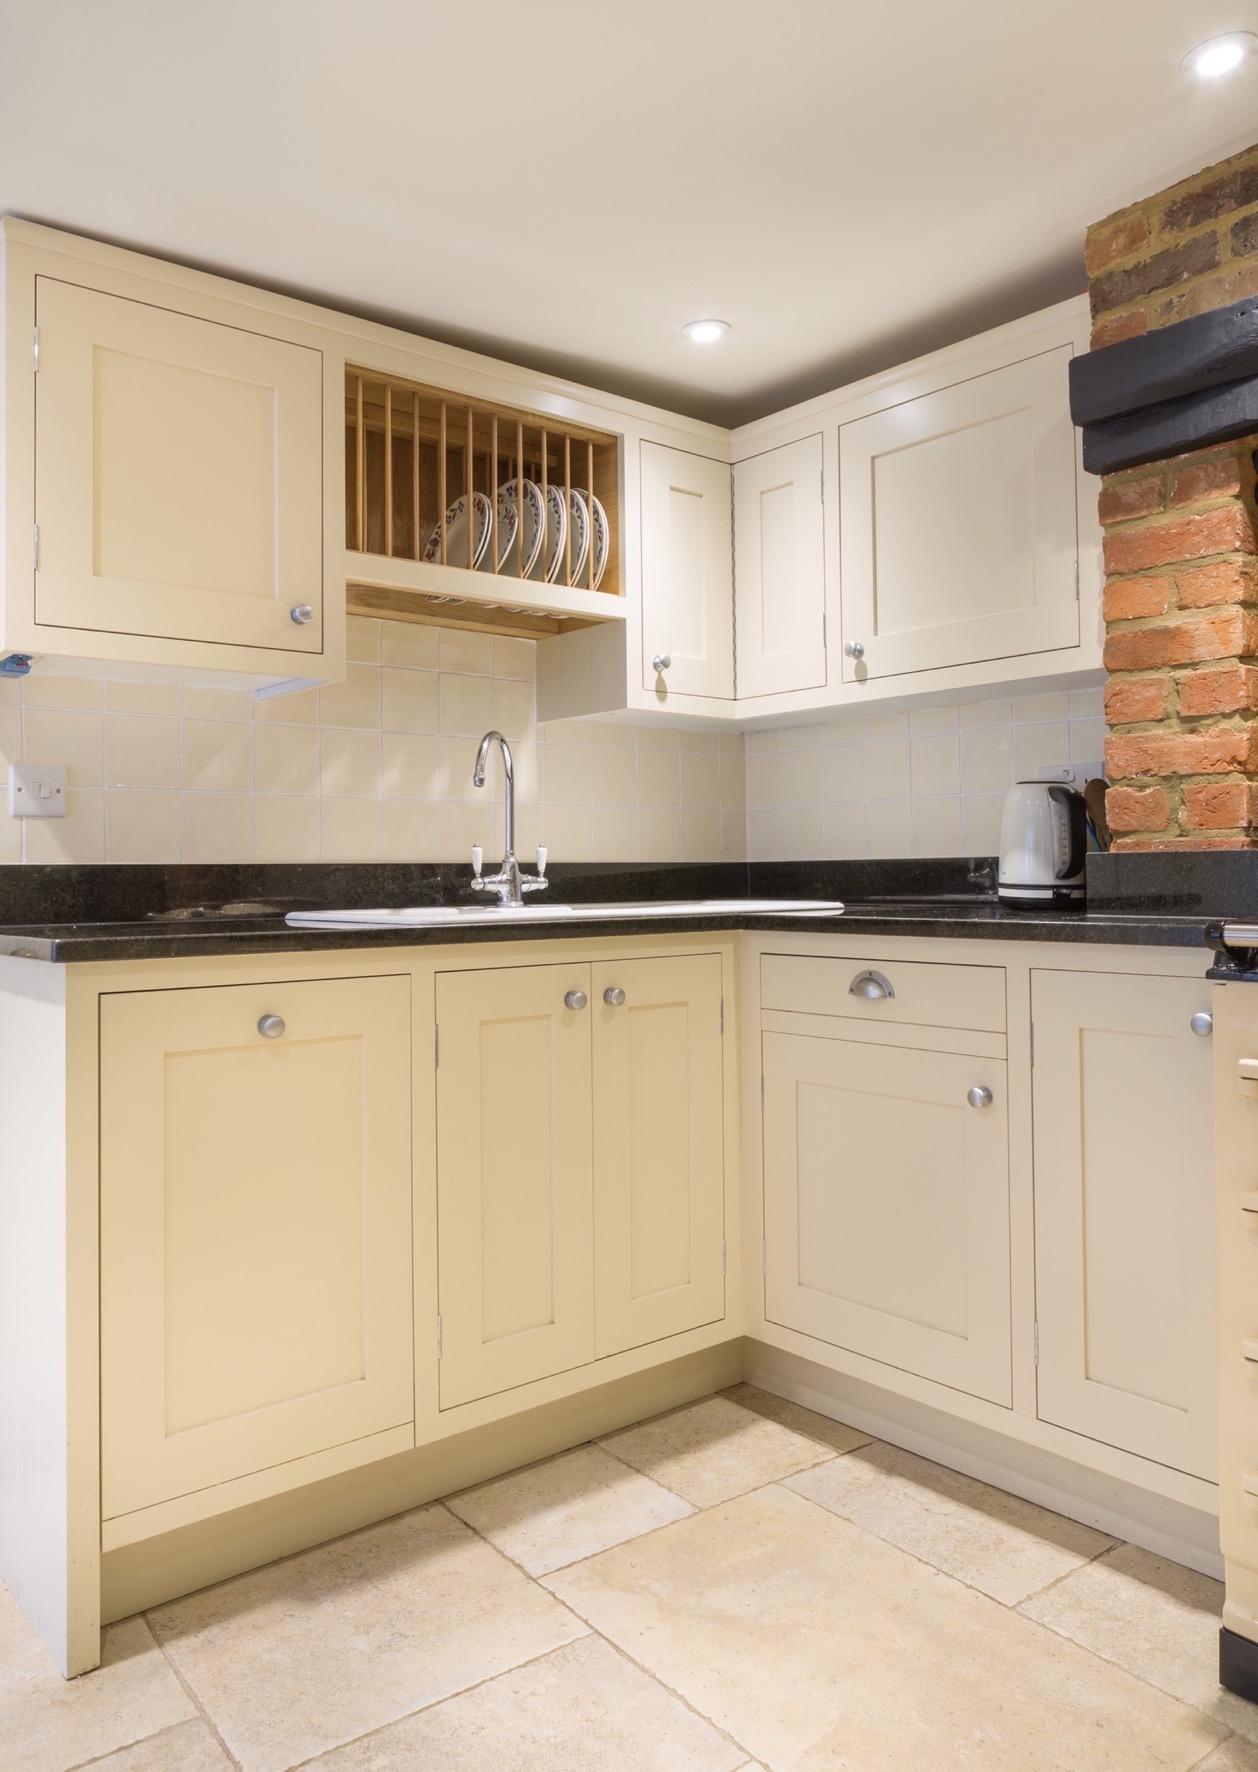 Oak plate rack bespoke inframe kitchen handpainted amersham buckinghamshire 2